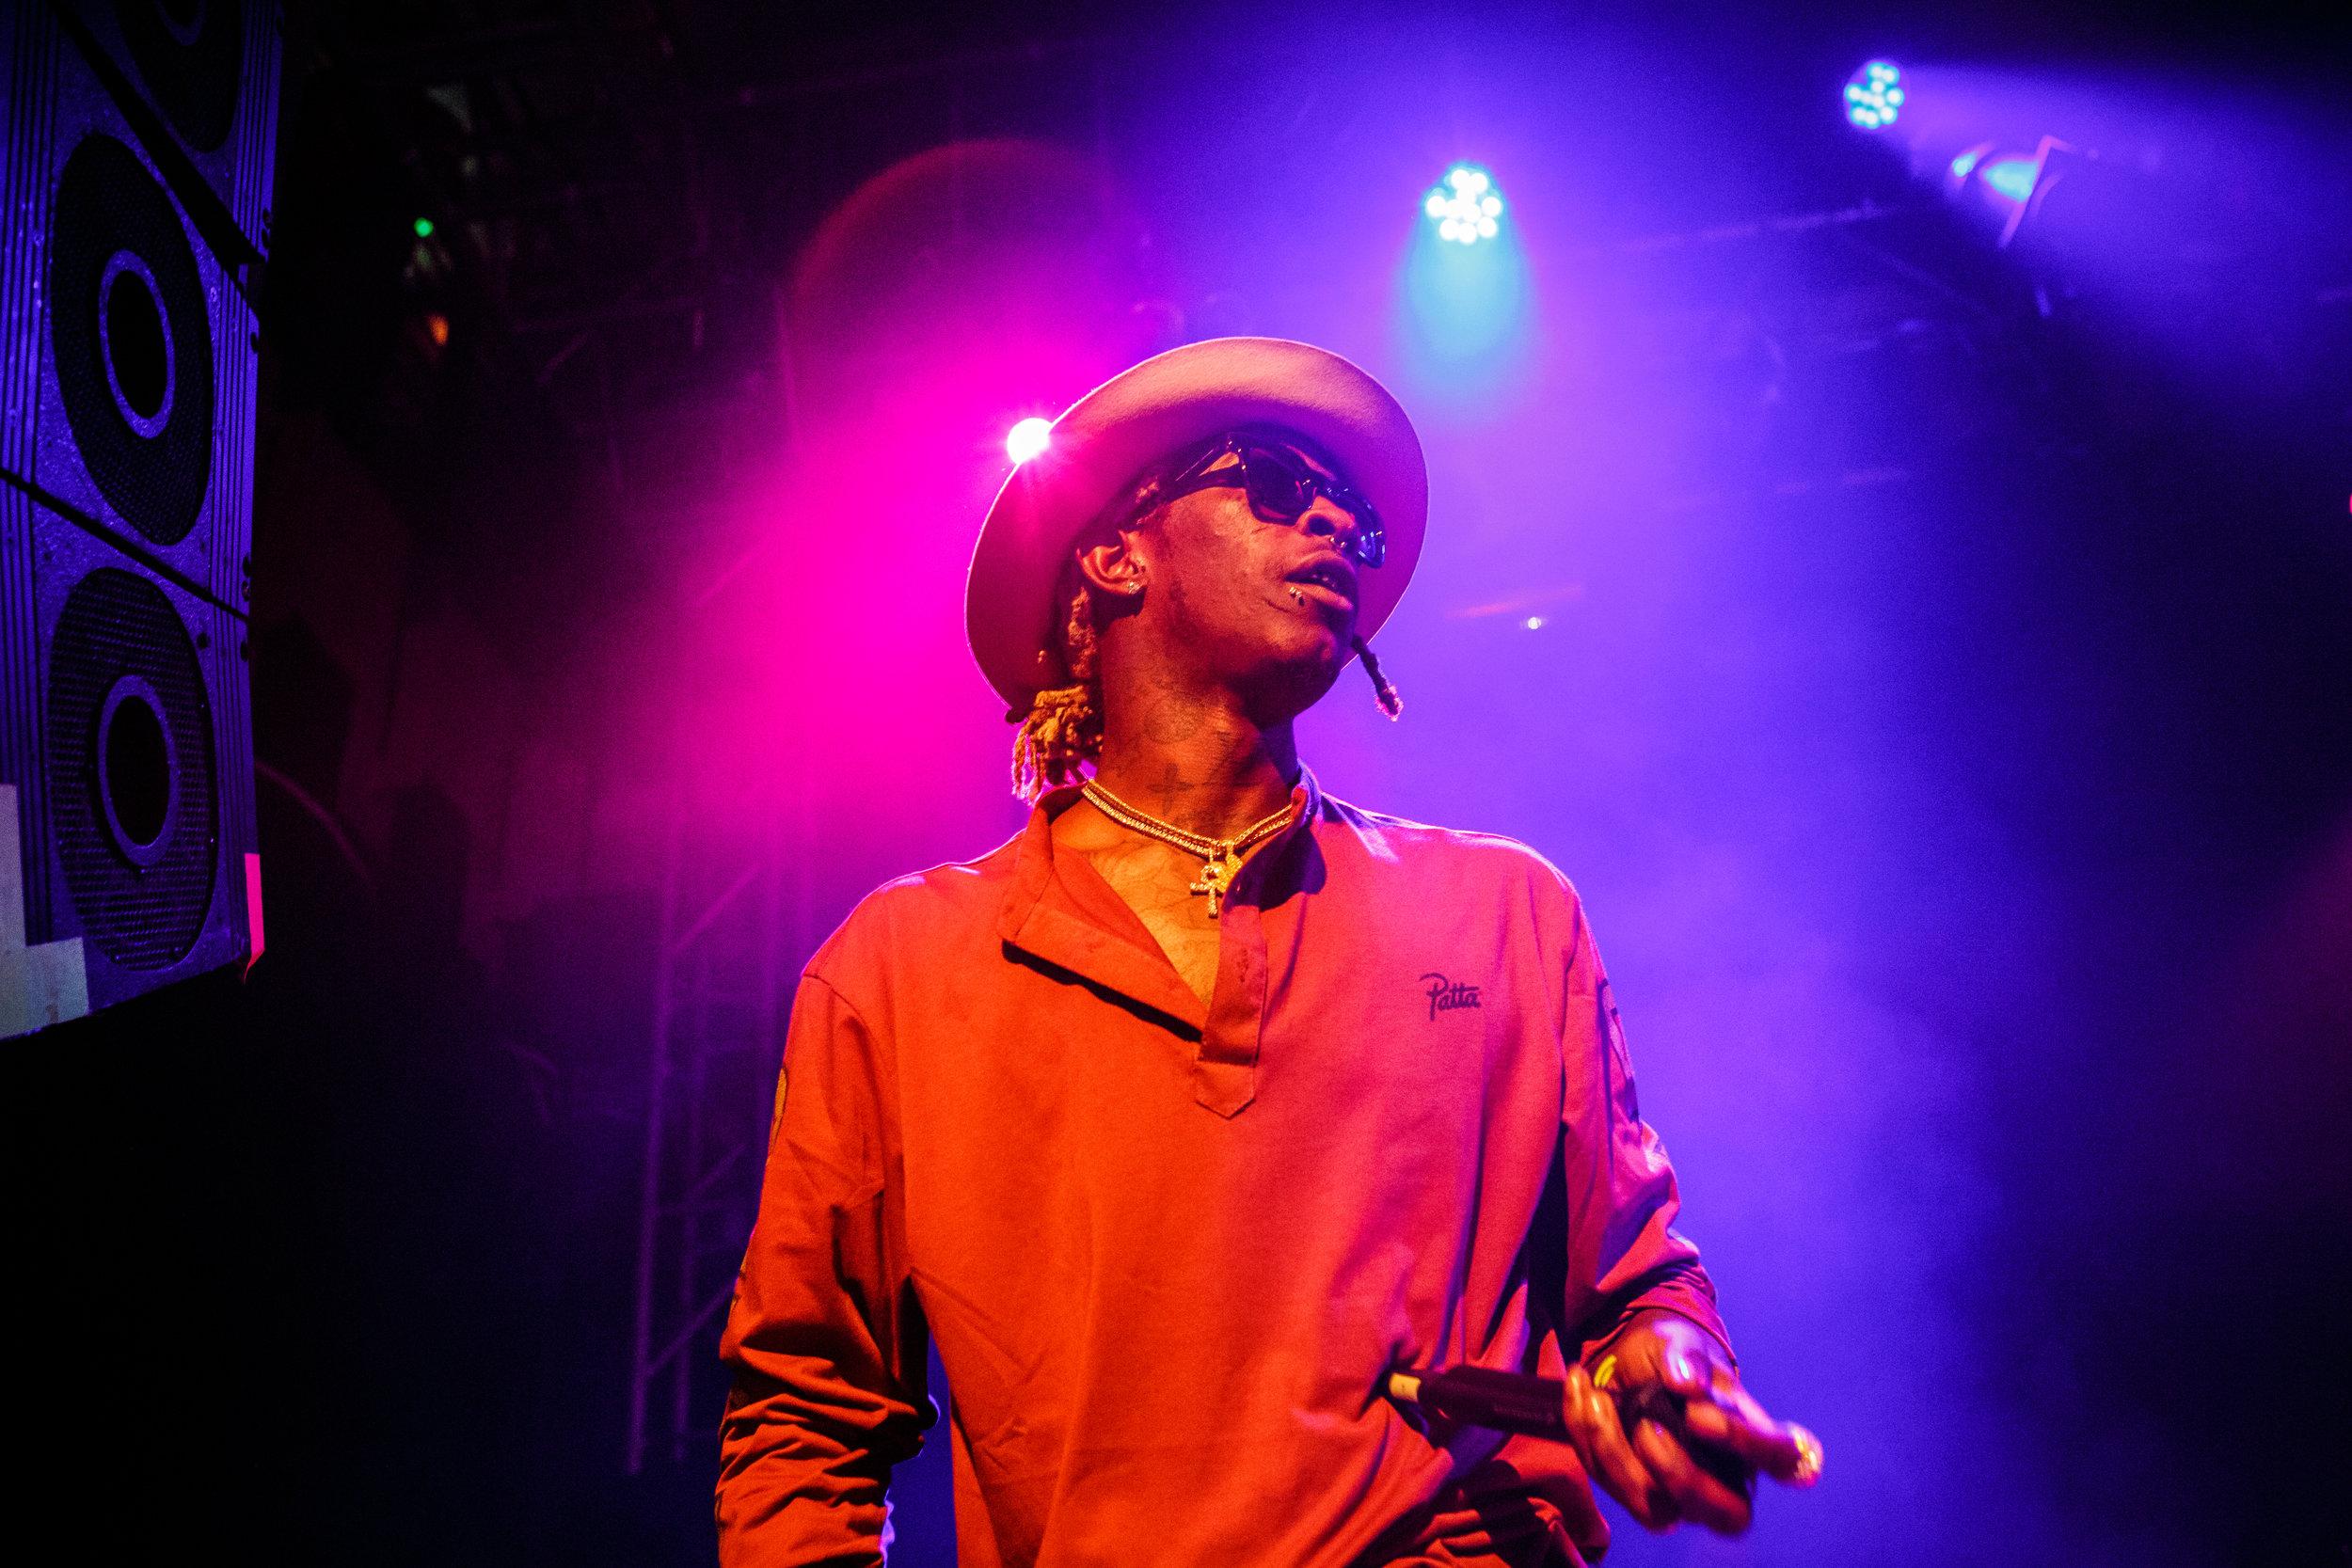 young-thug-performance-london.jpg